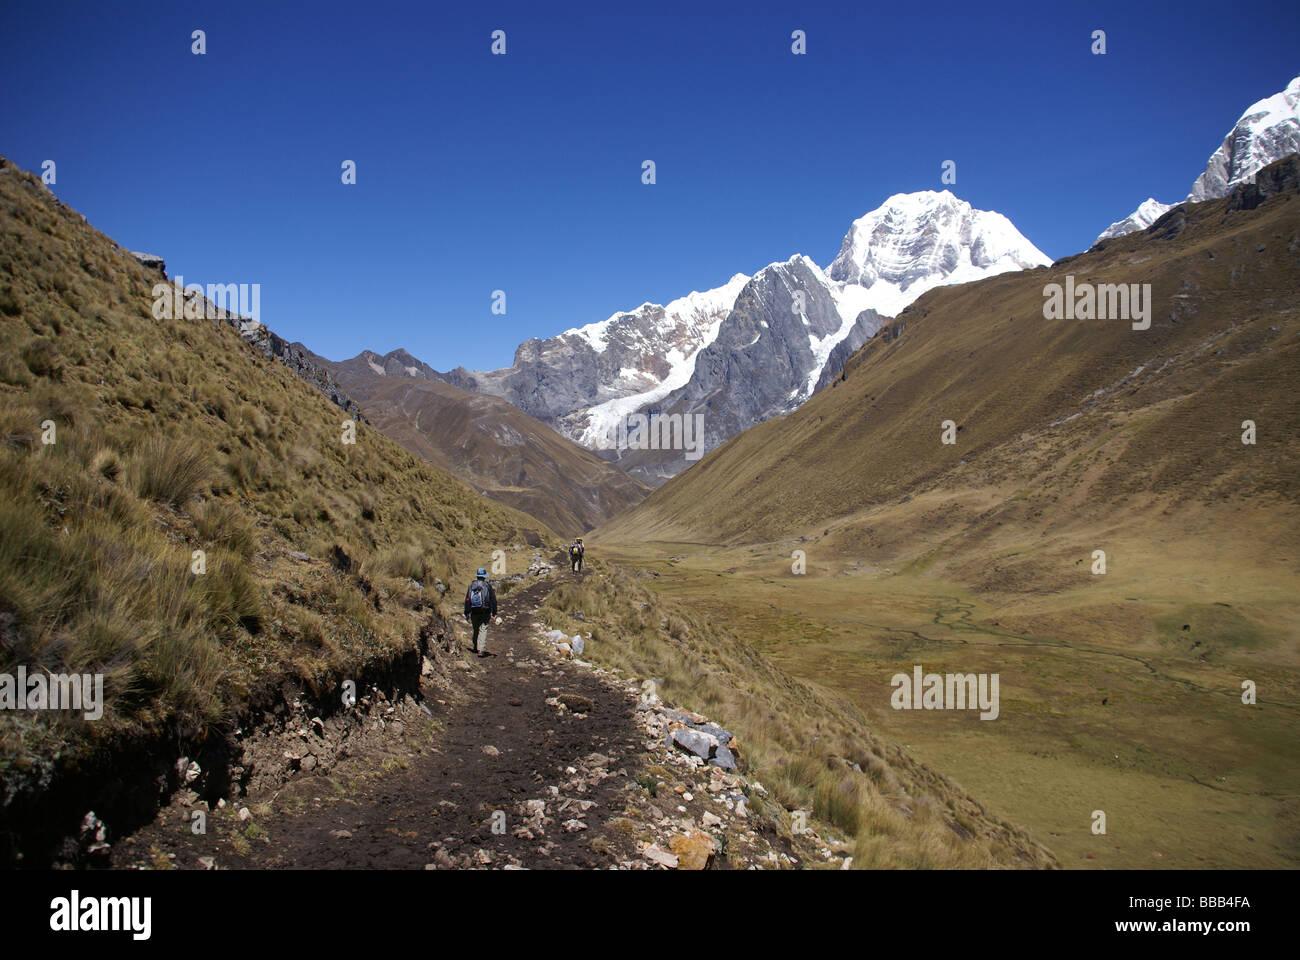 Siula mountain in high Andes Cordillera Huayhuash Andes Peru South America - Stock Image